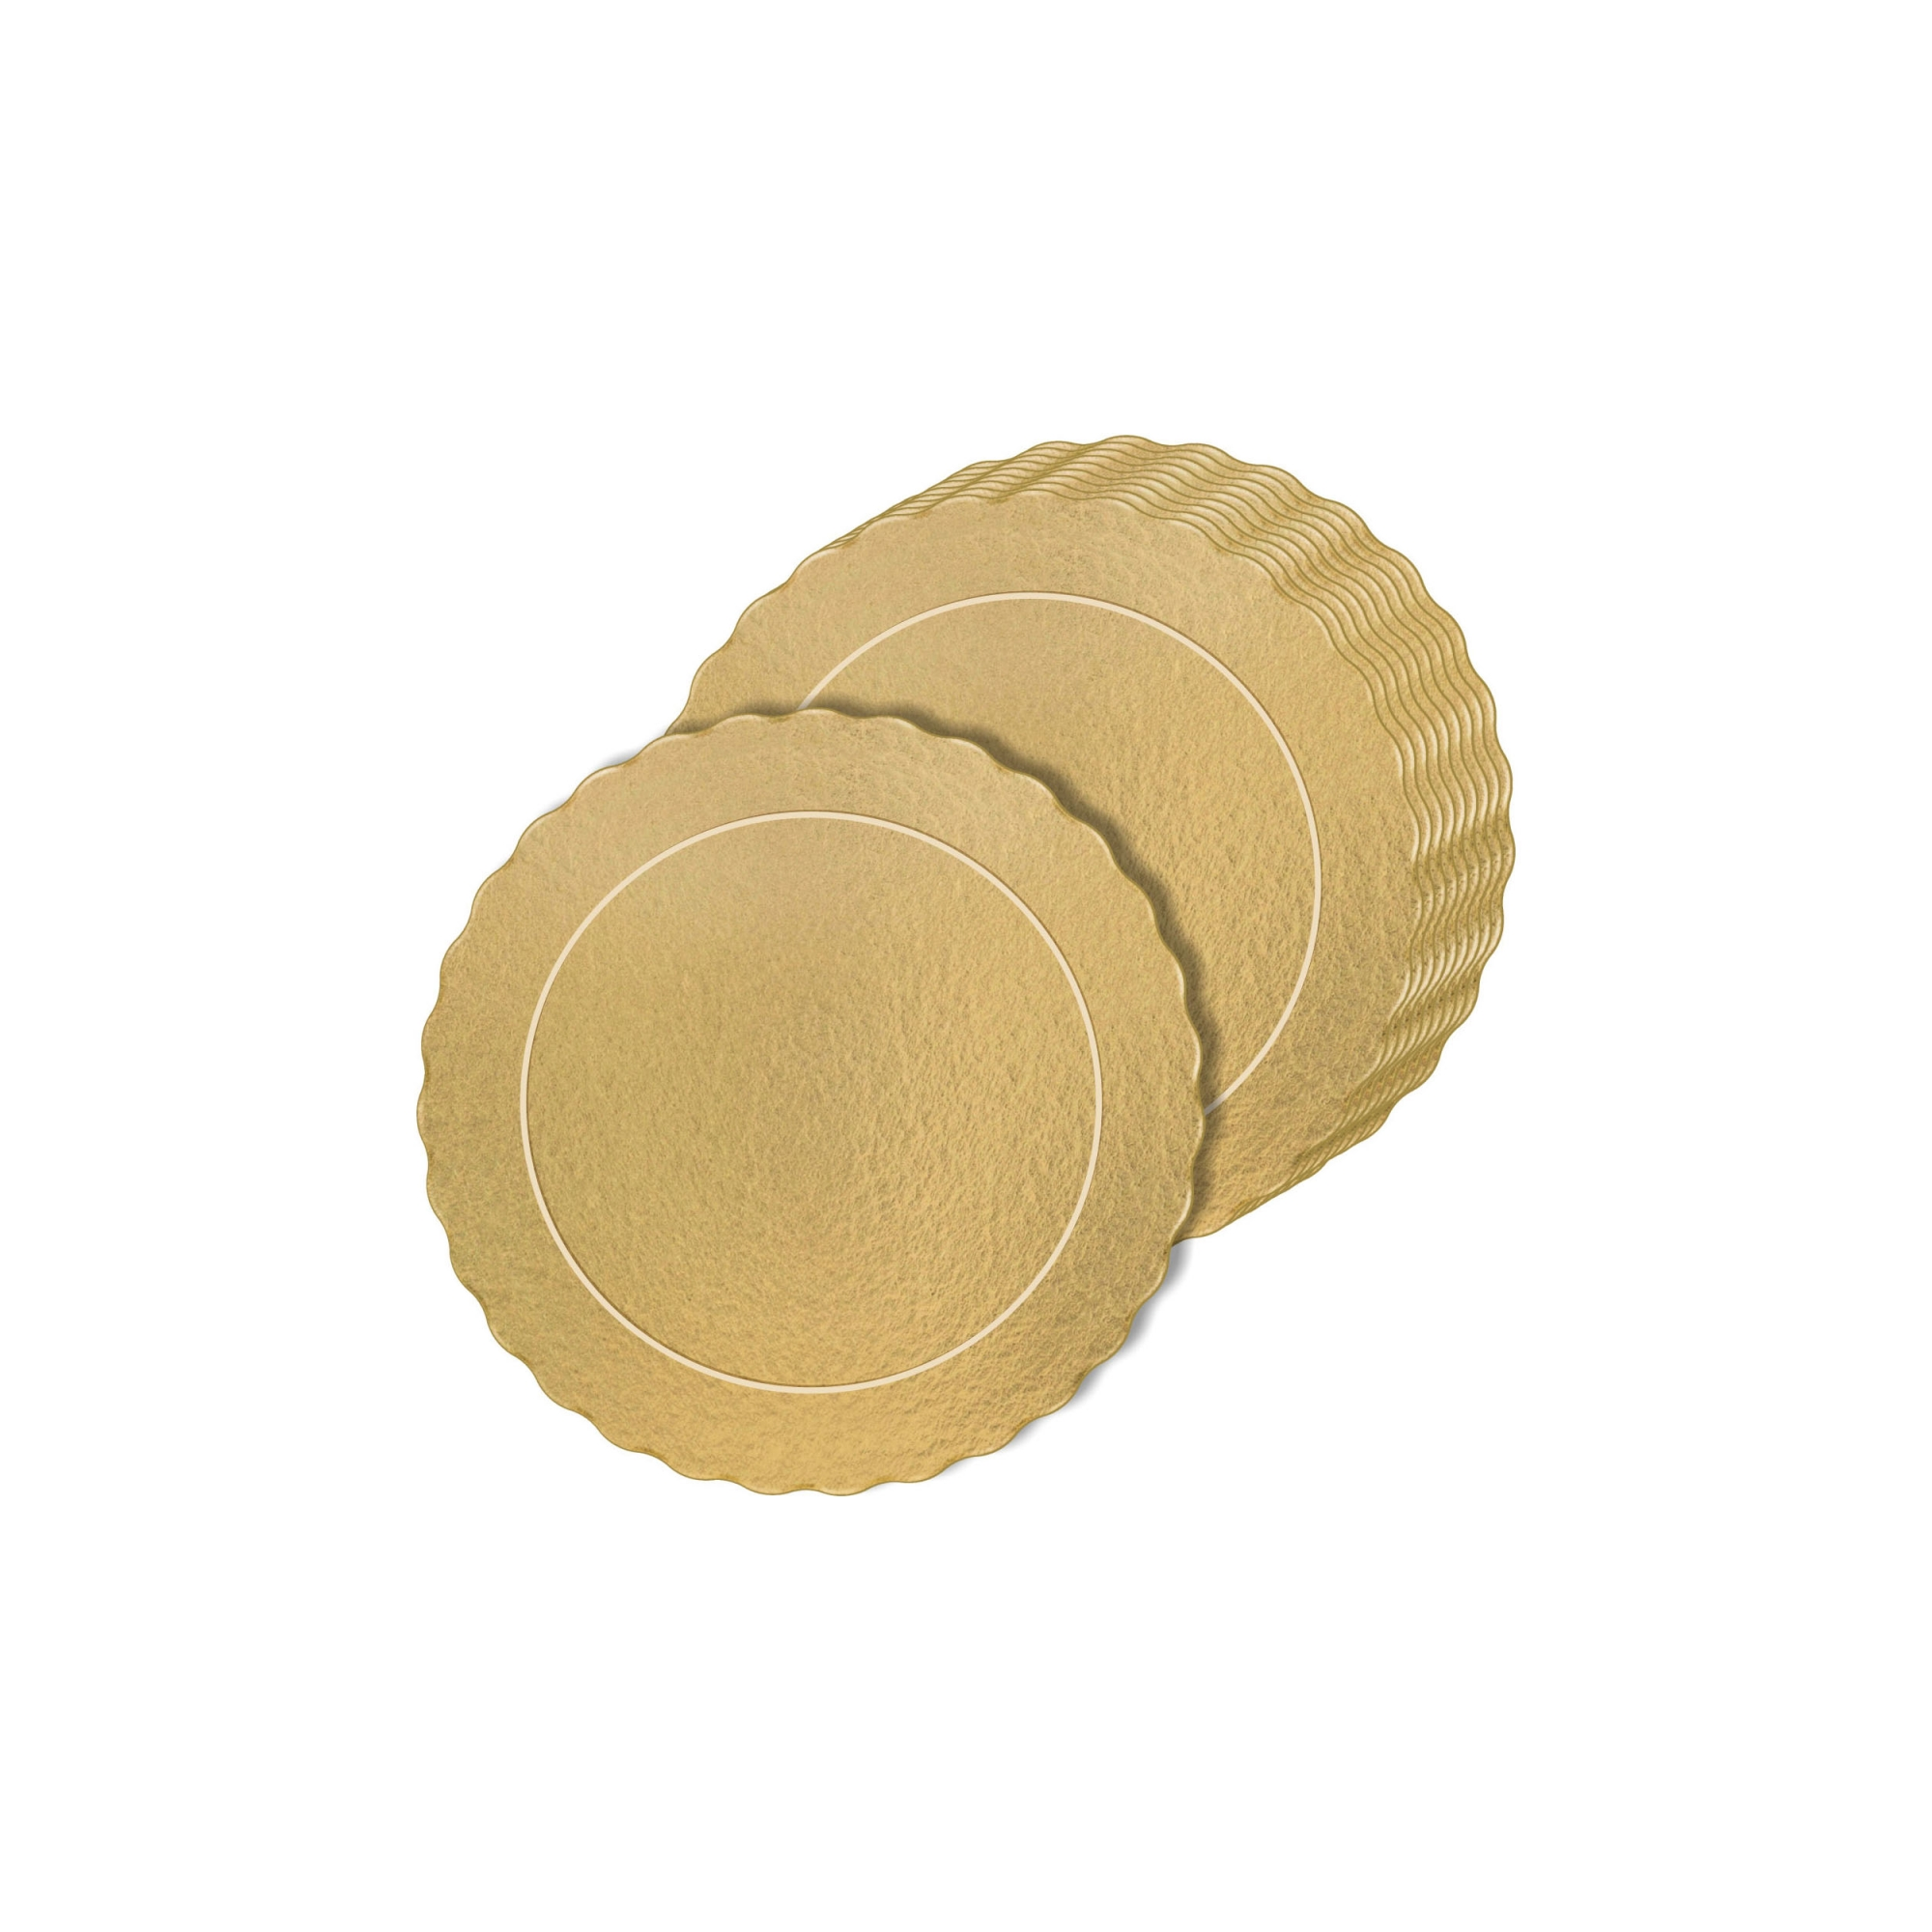 200 Base Laminada, Suporte P/ Bolo, Cake Board, 12cm - Ouro